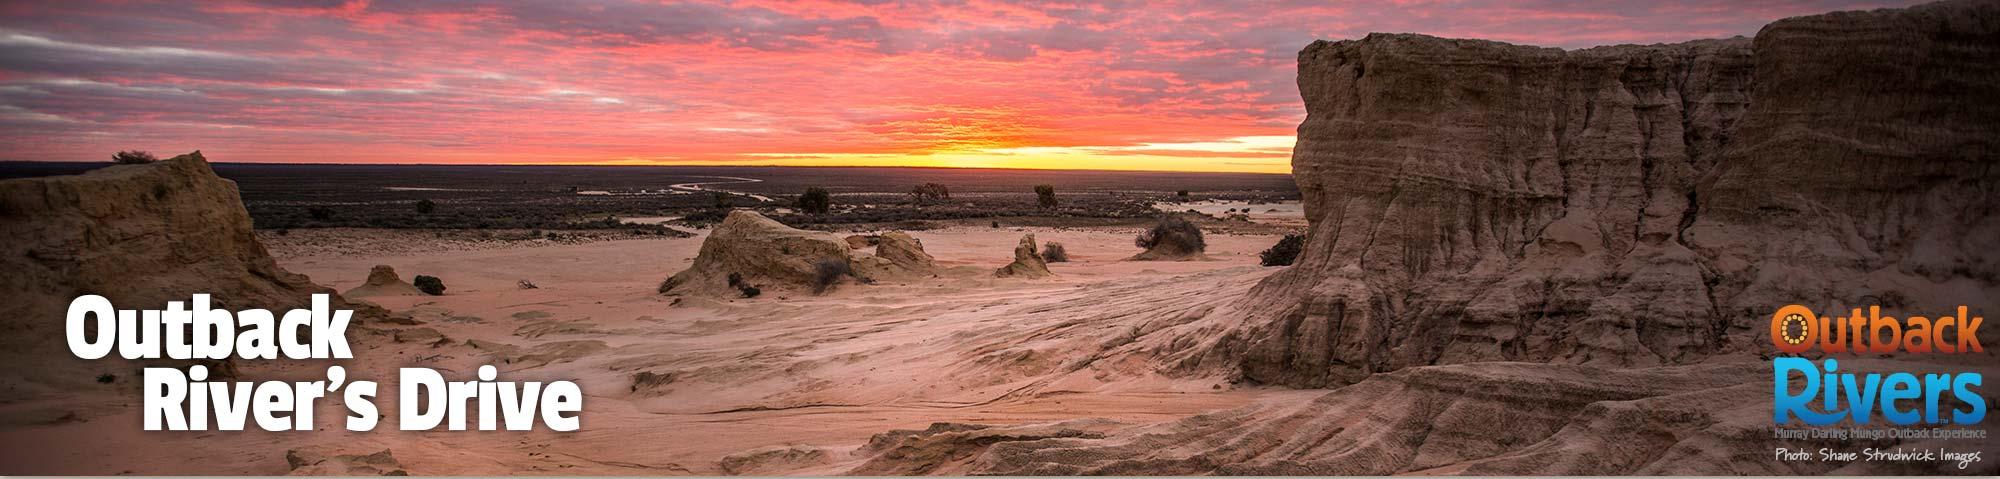 Outback Rivers Drive - Euston, Mungo National Park, Mildura - Shane Strudwick Images